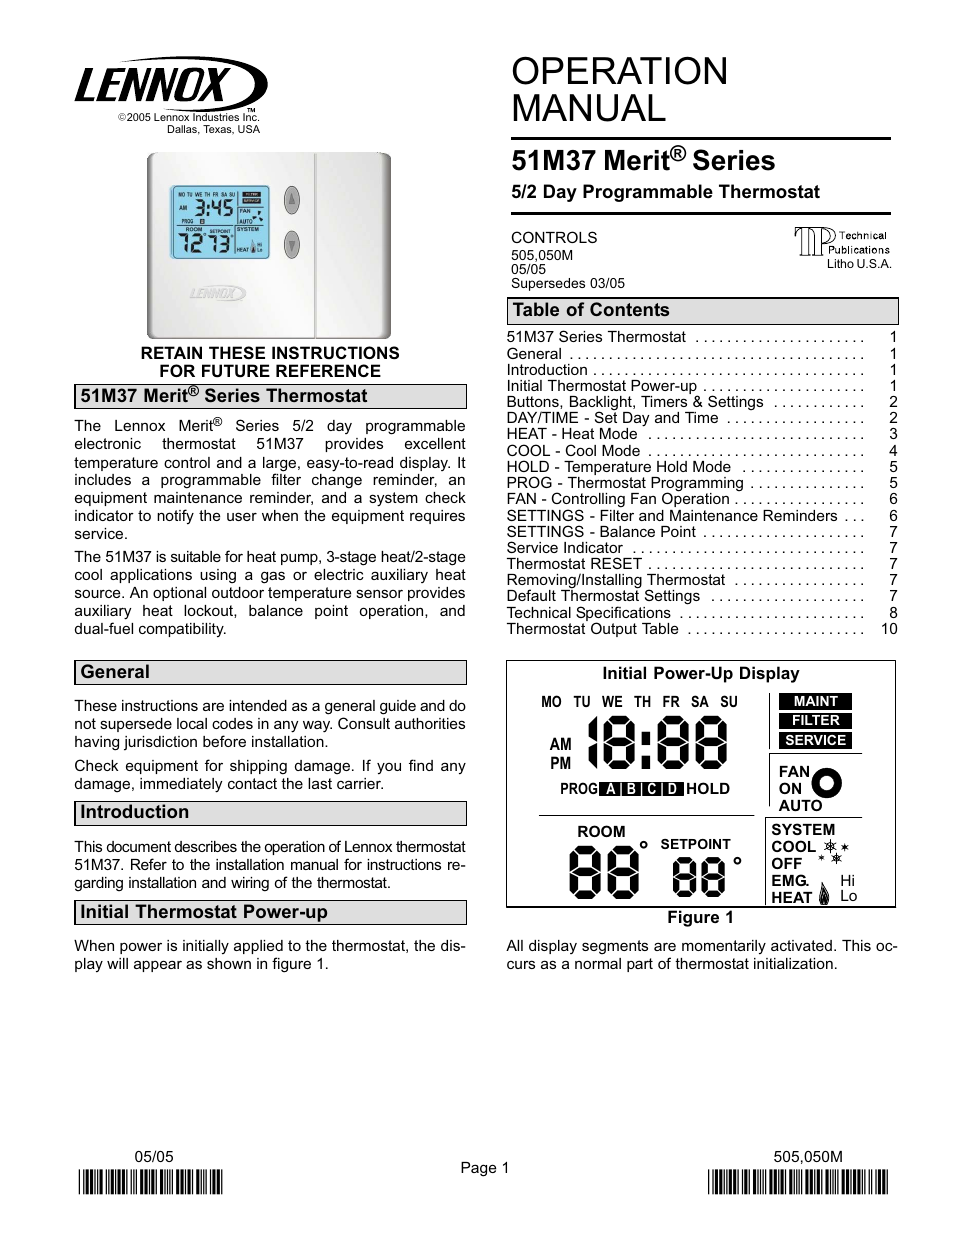 Lennox International Inc. 51M37 User Manual | 54 pages